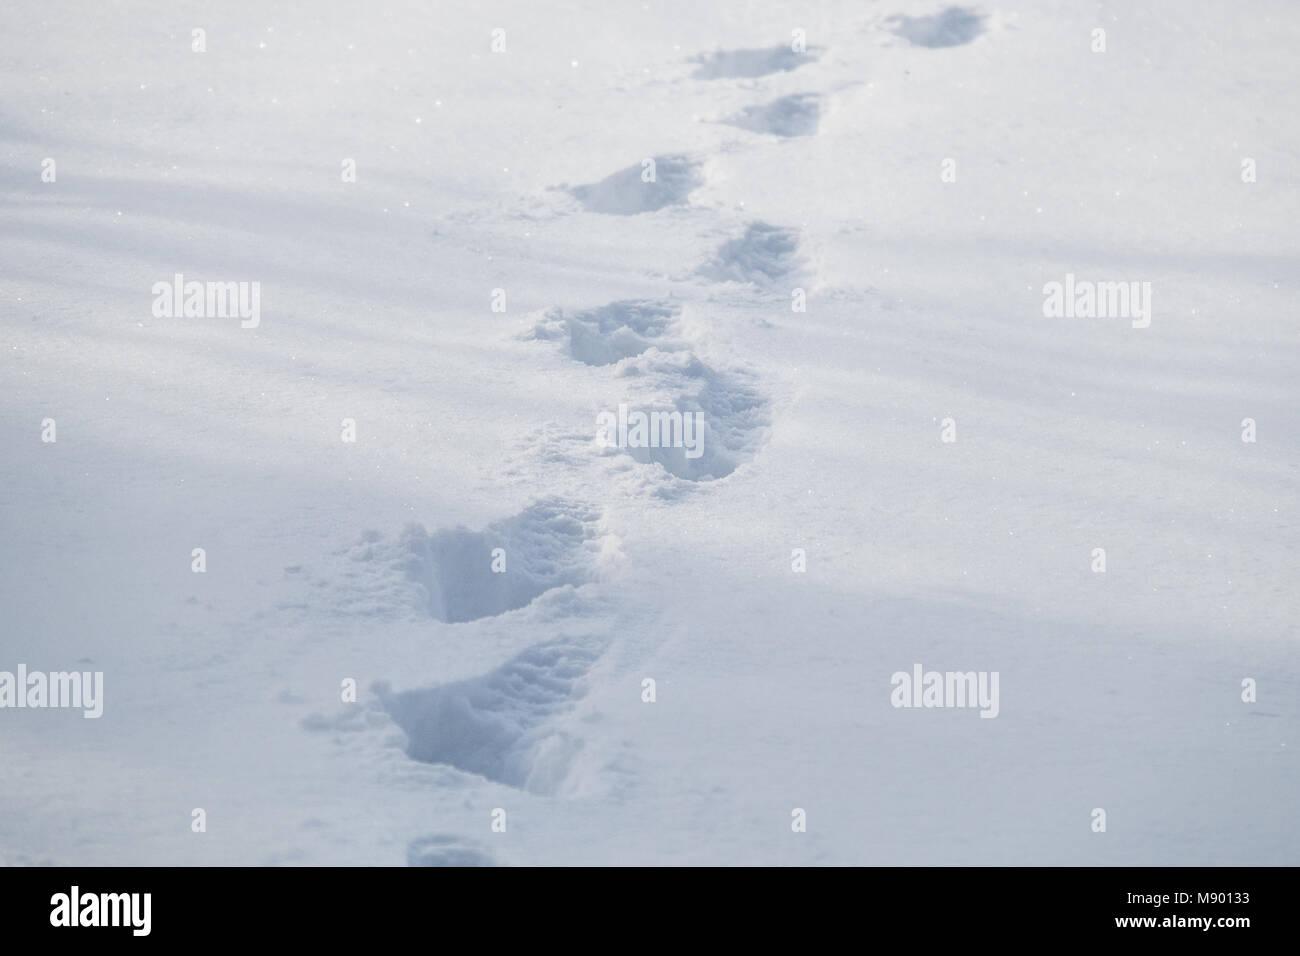 Spuren durch den Schnee Stockbild